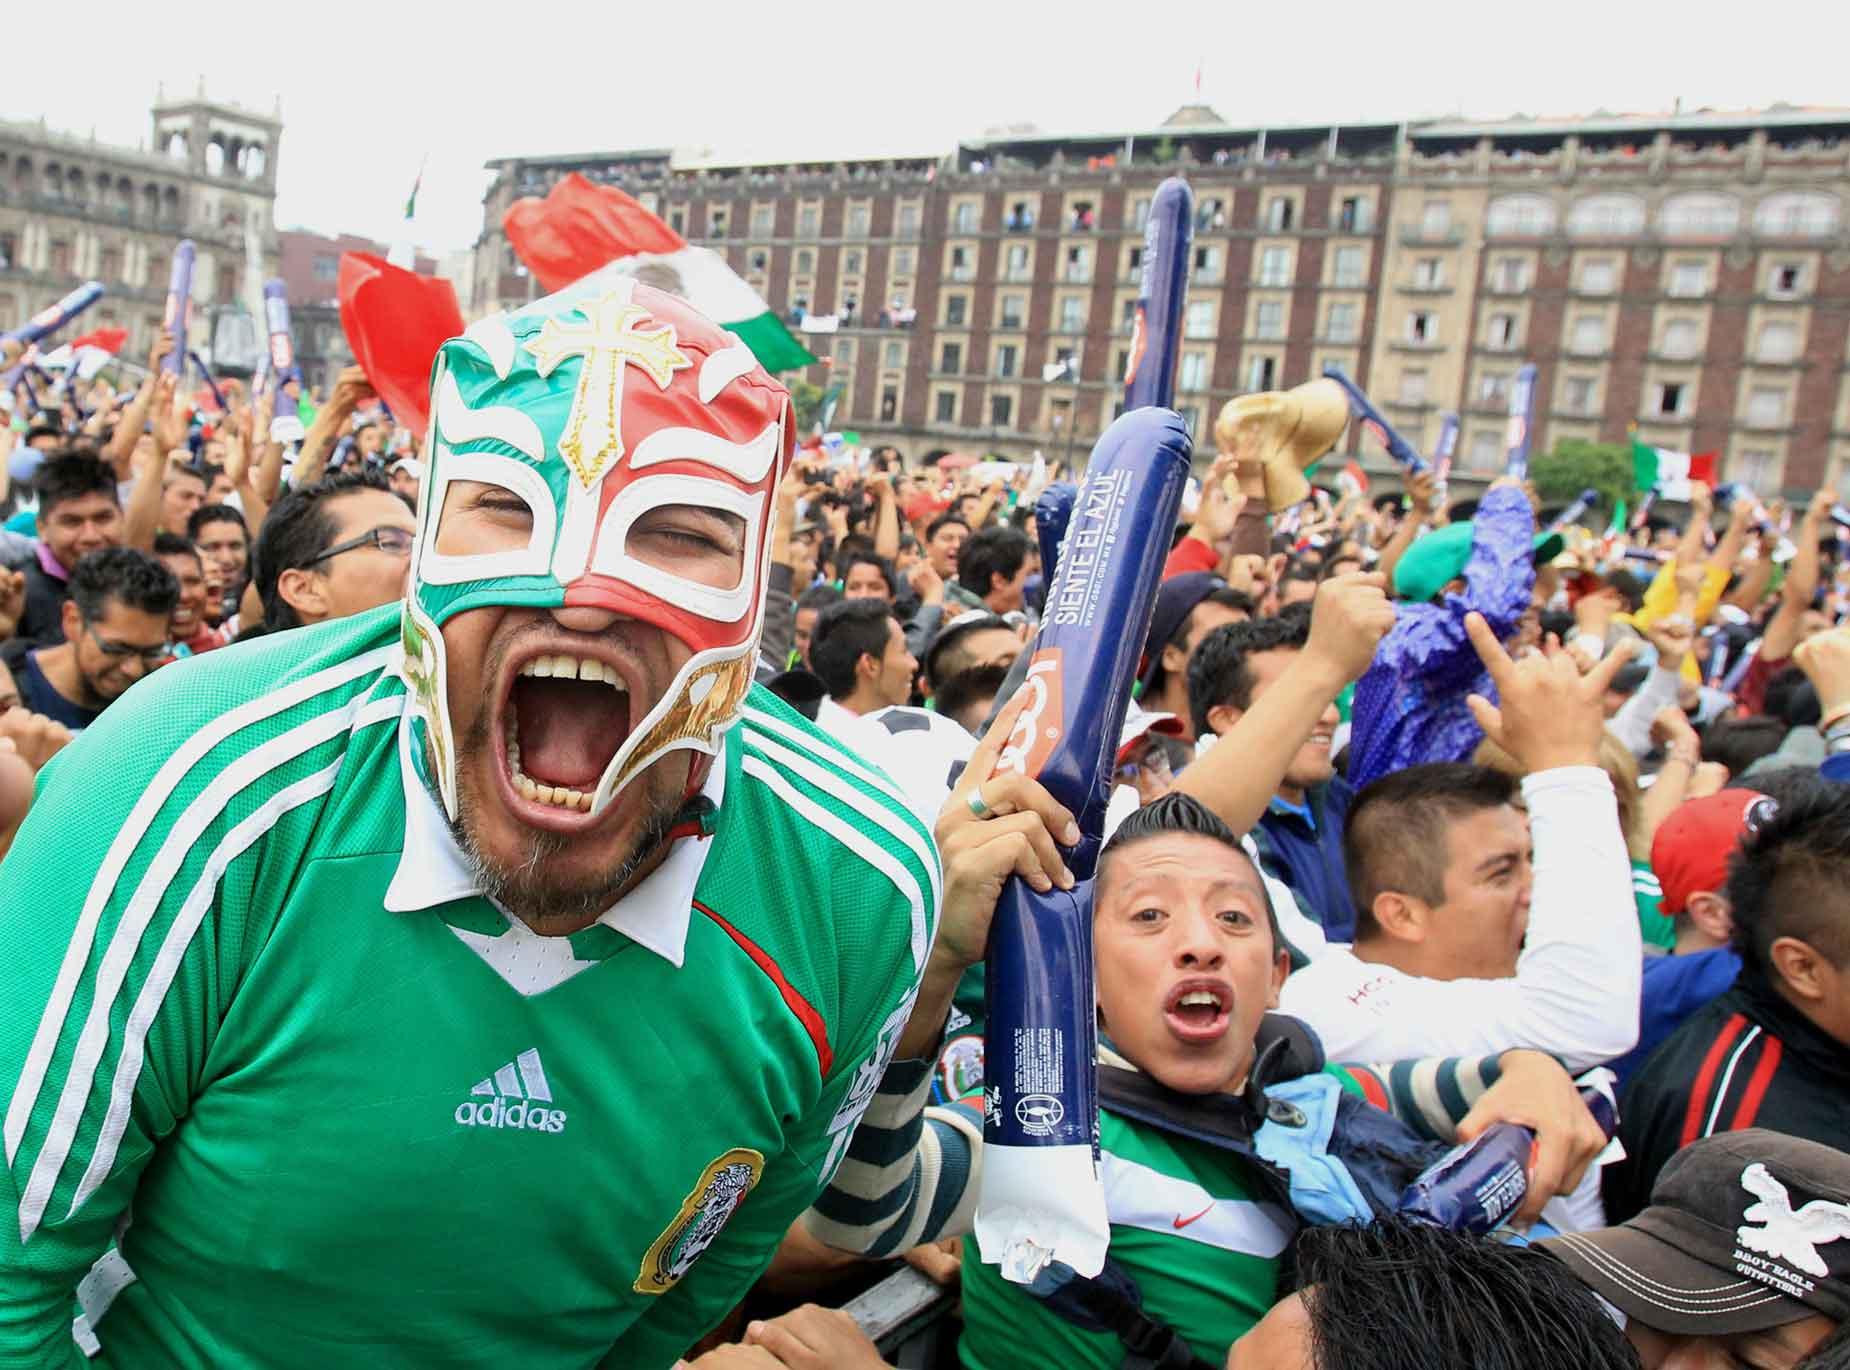 Aficionados Mexicanos Mundial Escándalos Rusia 2018 Copas del Mundo Selección Mexicana